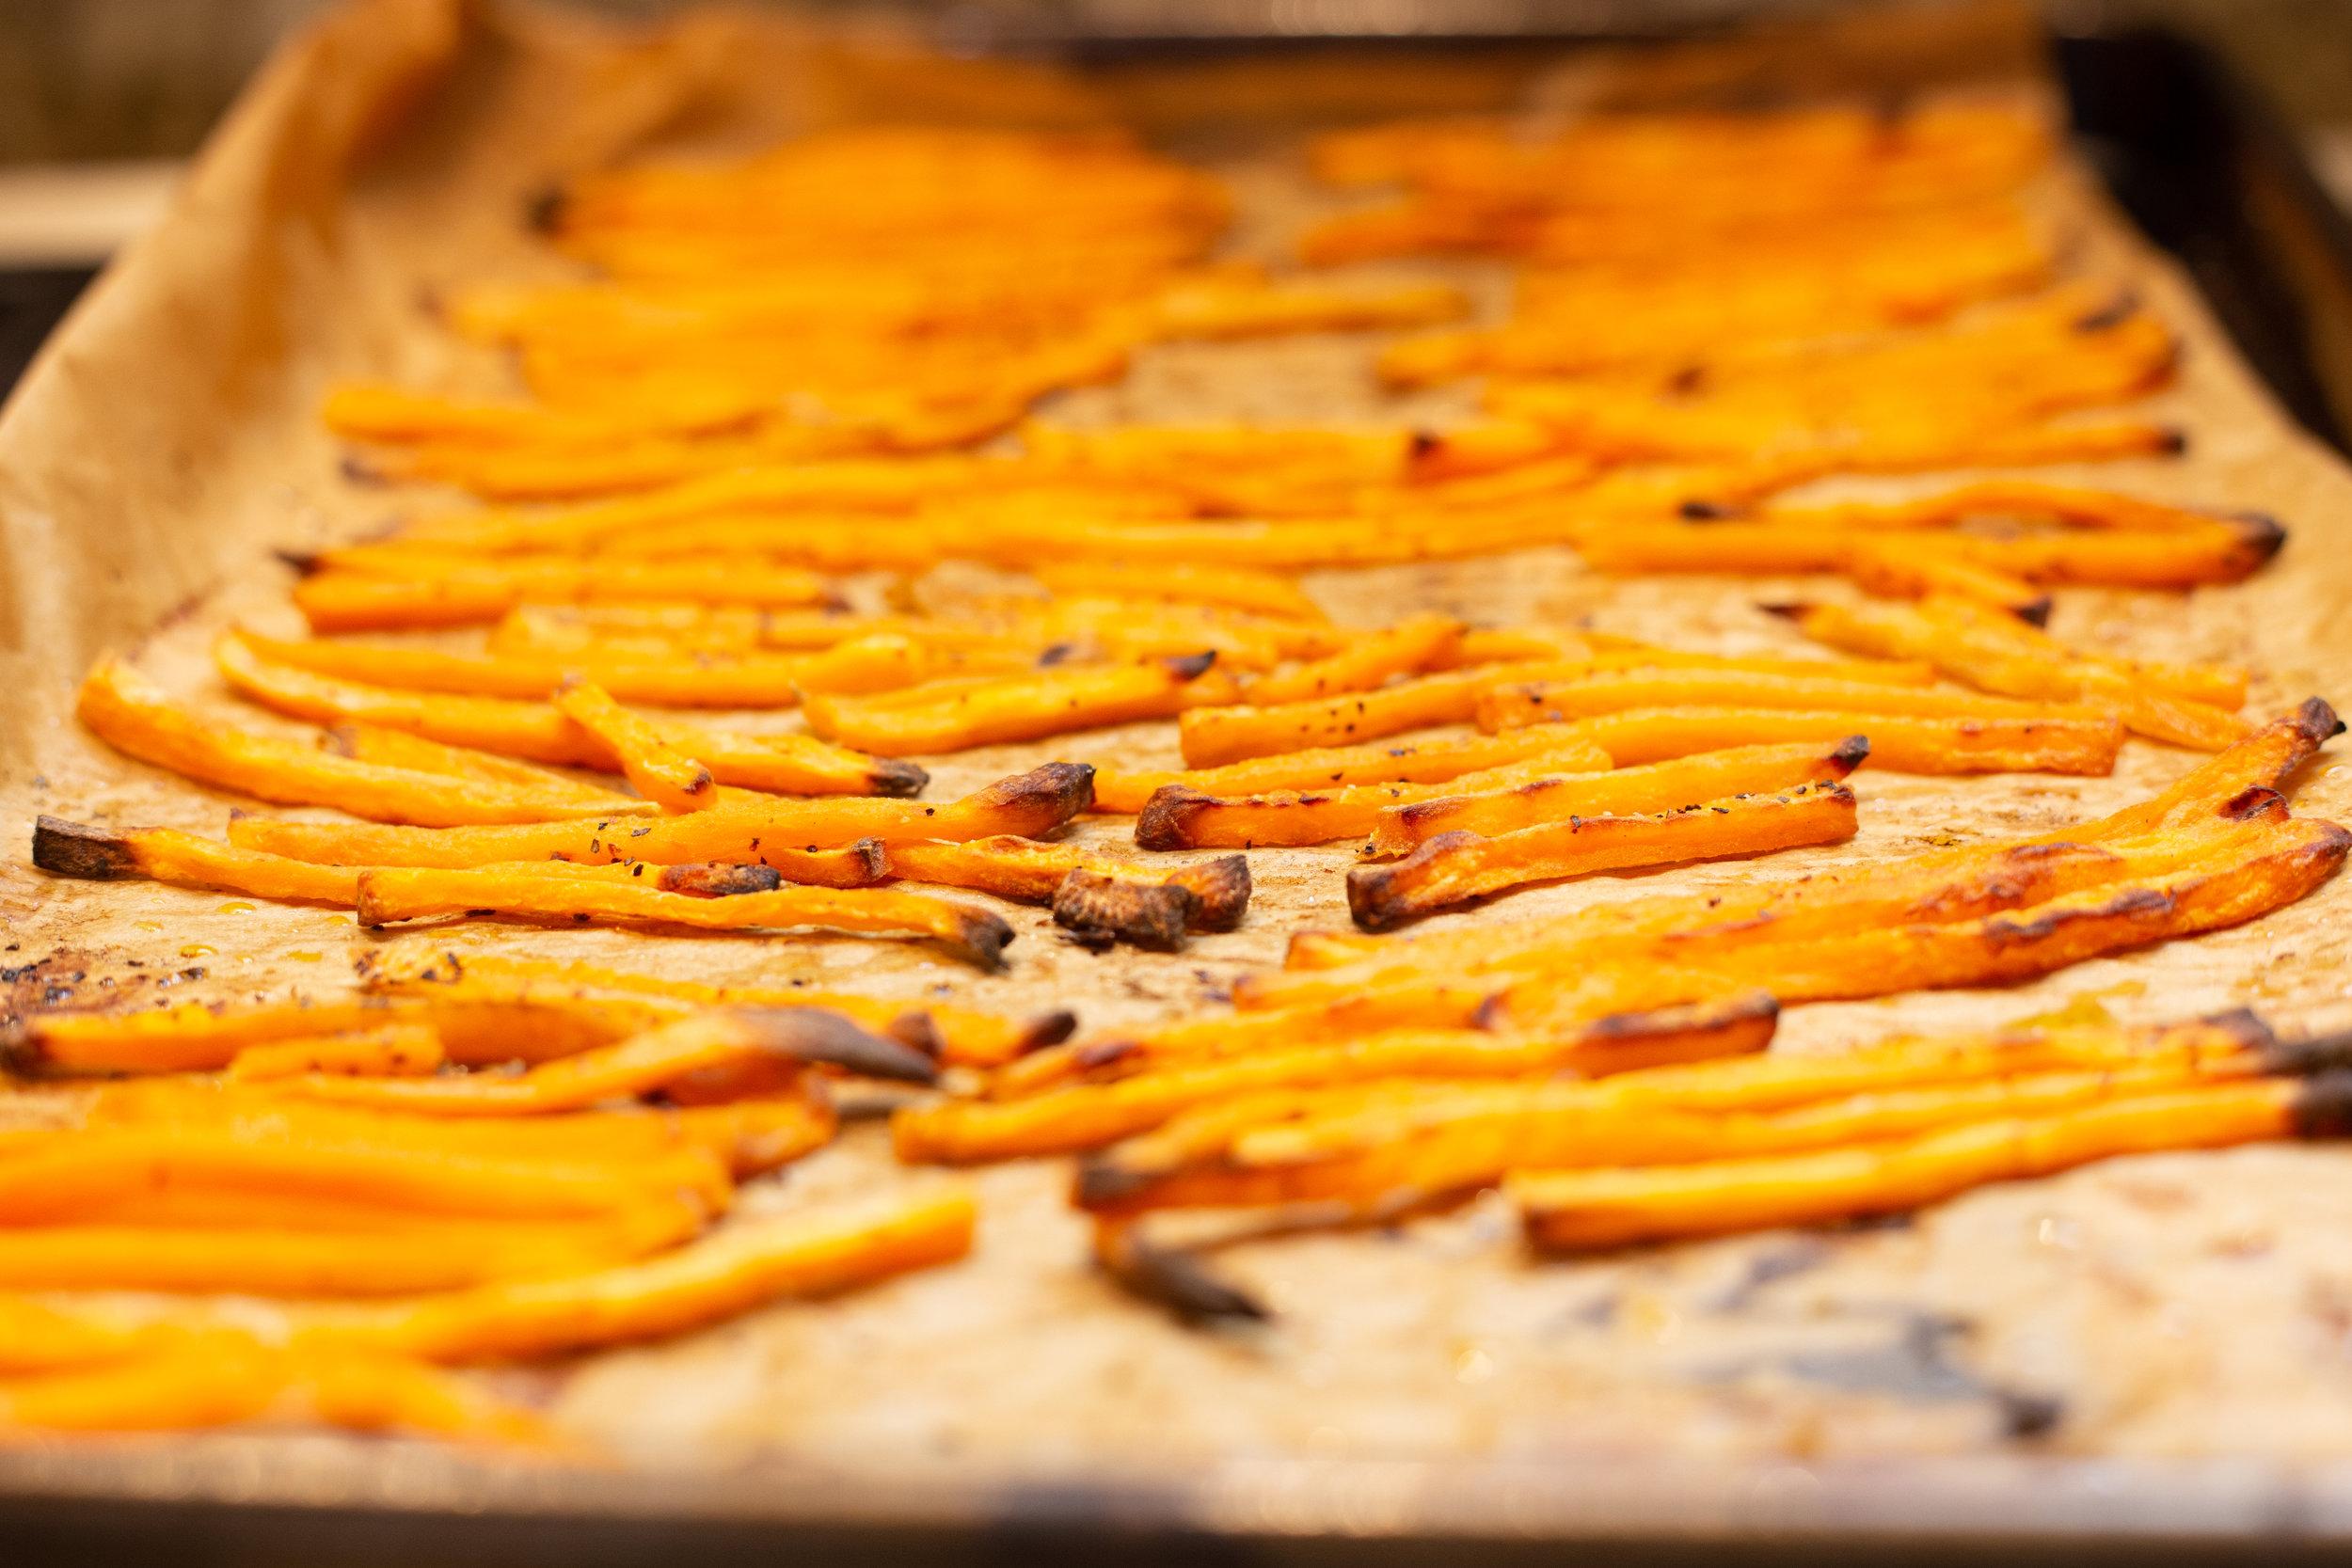 Karina Heinrich_Cinnamon Sweet Potato Food 1 2018.jpg